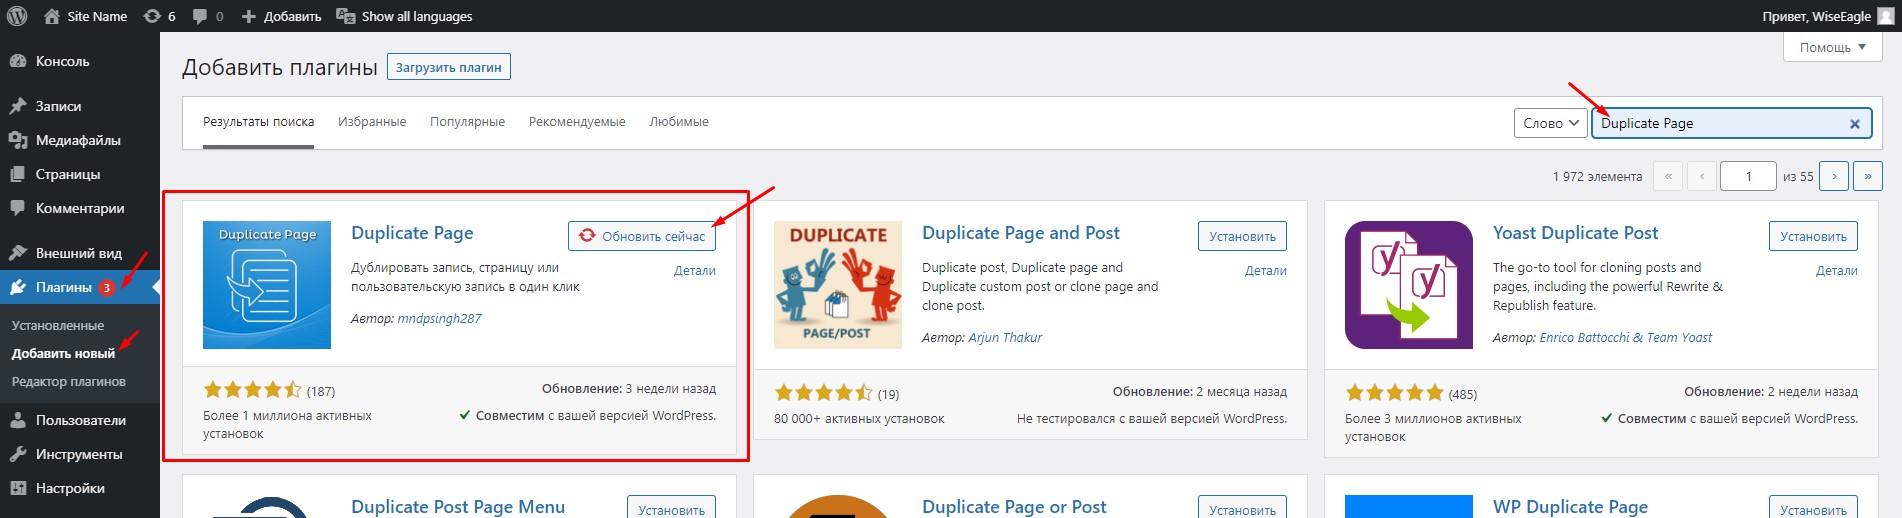 duolicate page in wordpress